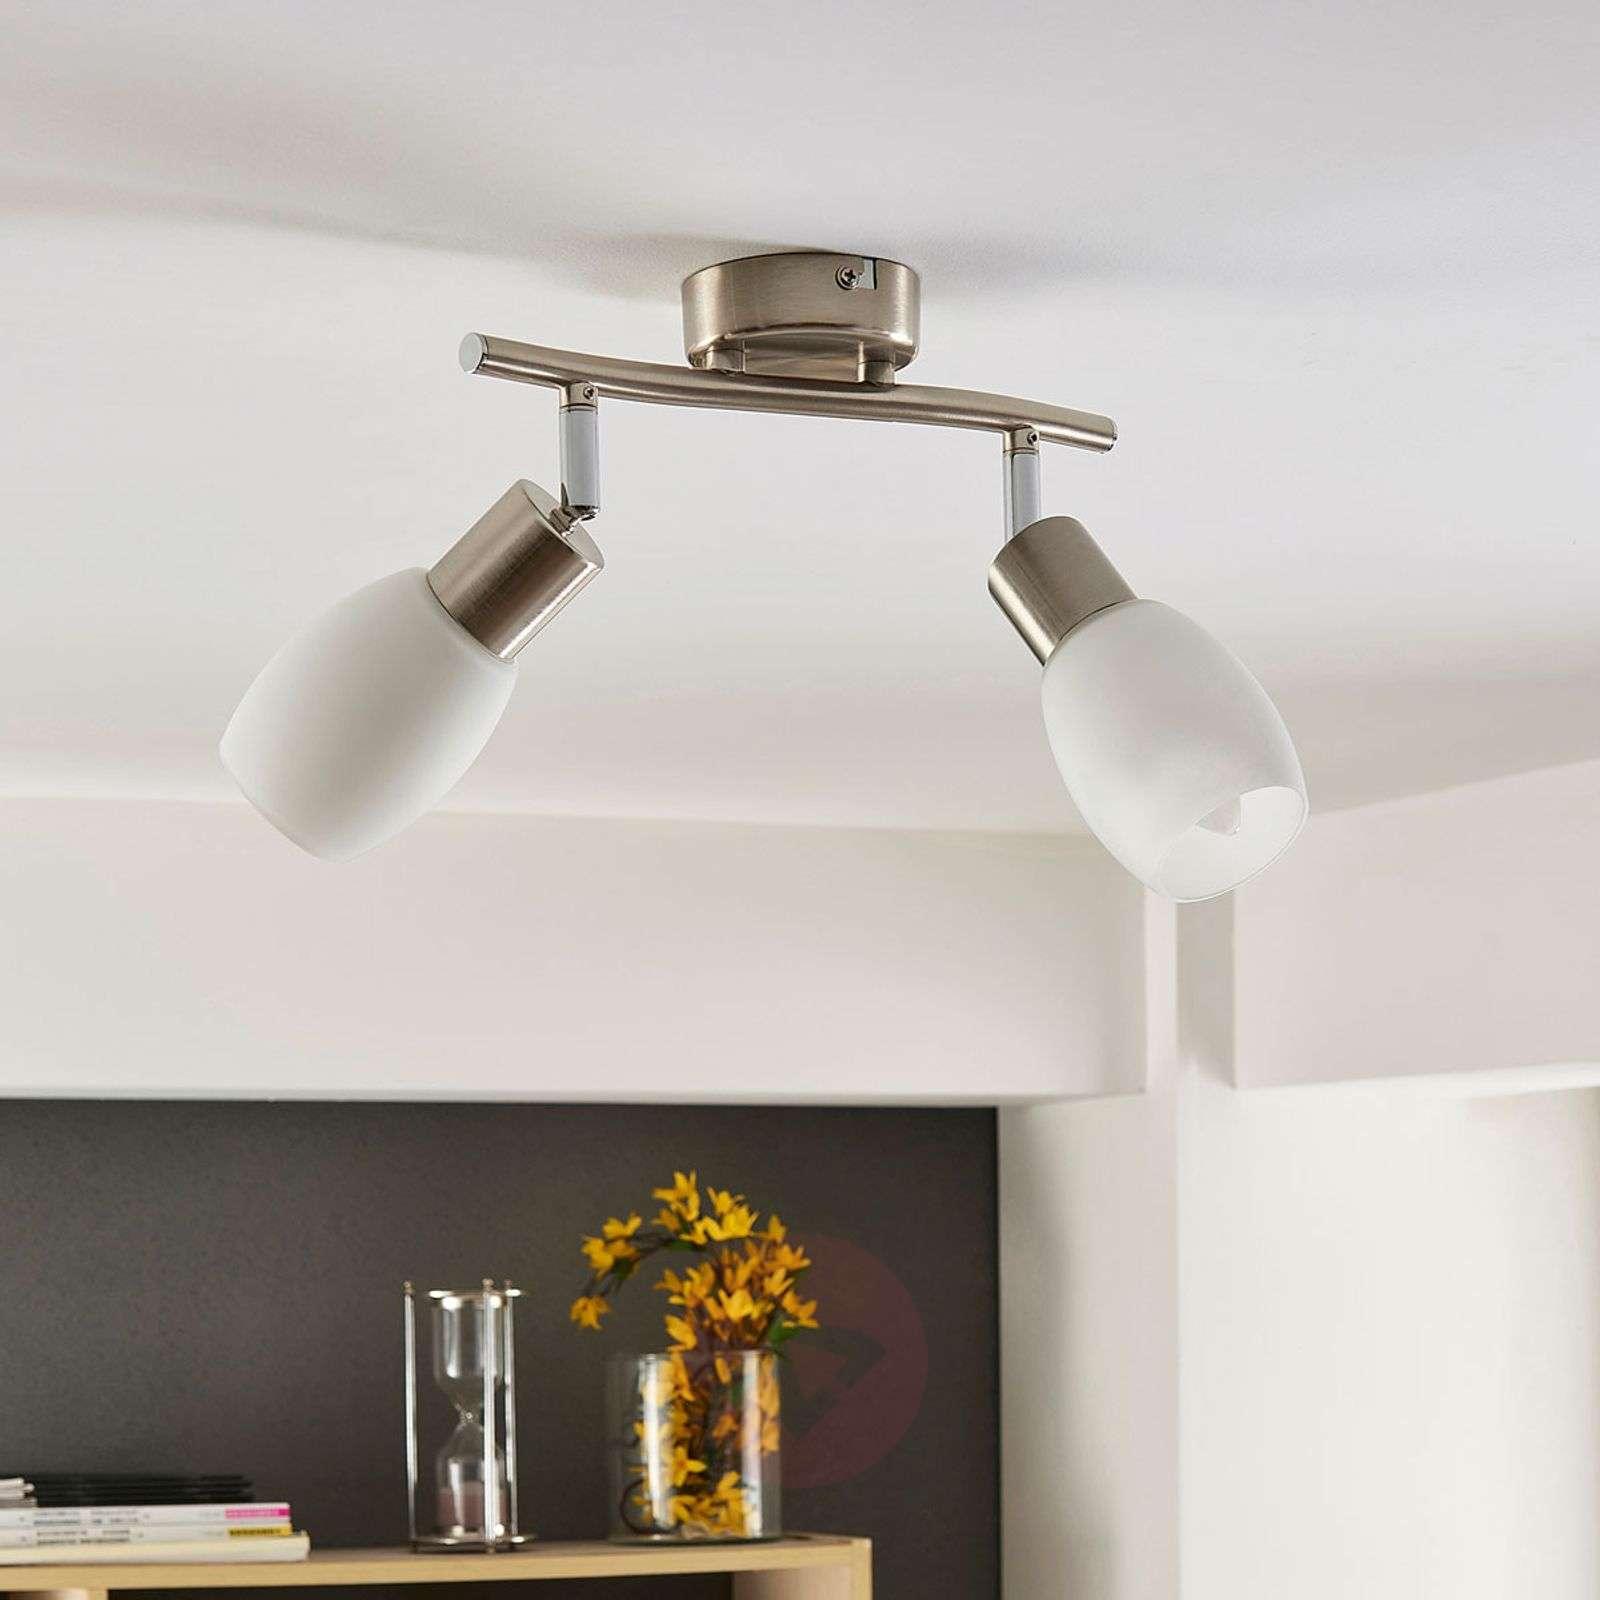 Arda easydim-LED-kohdevalaisin seinälle ja kattoon-9621263-02